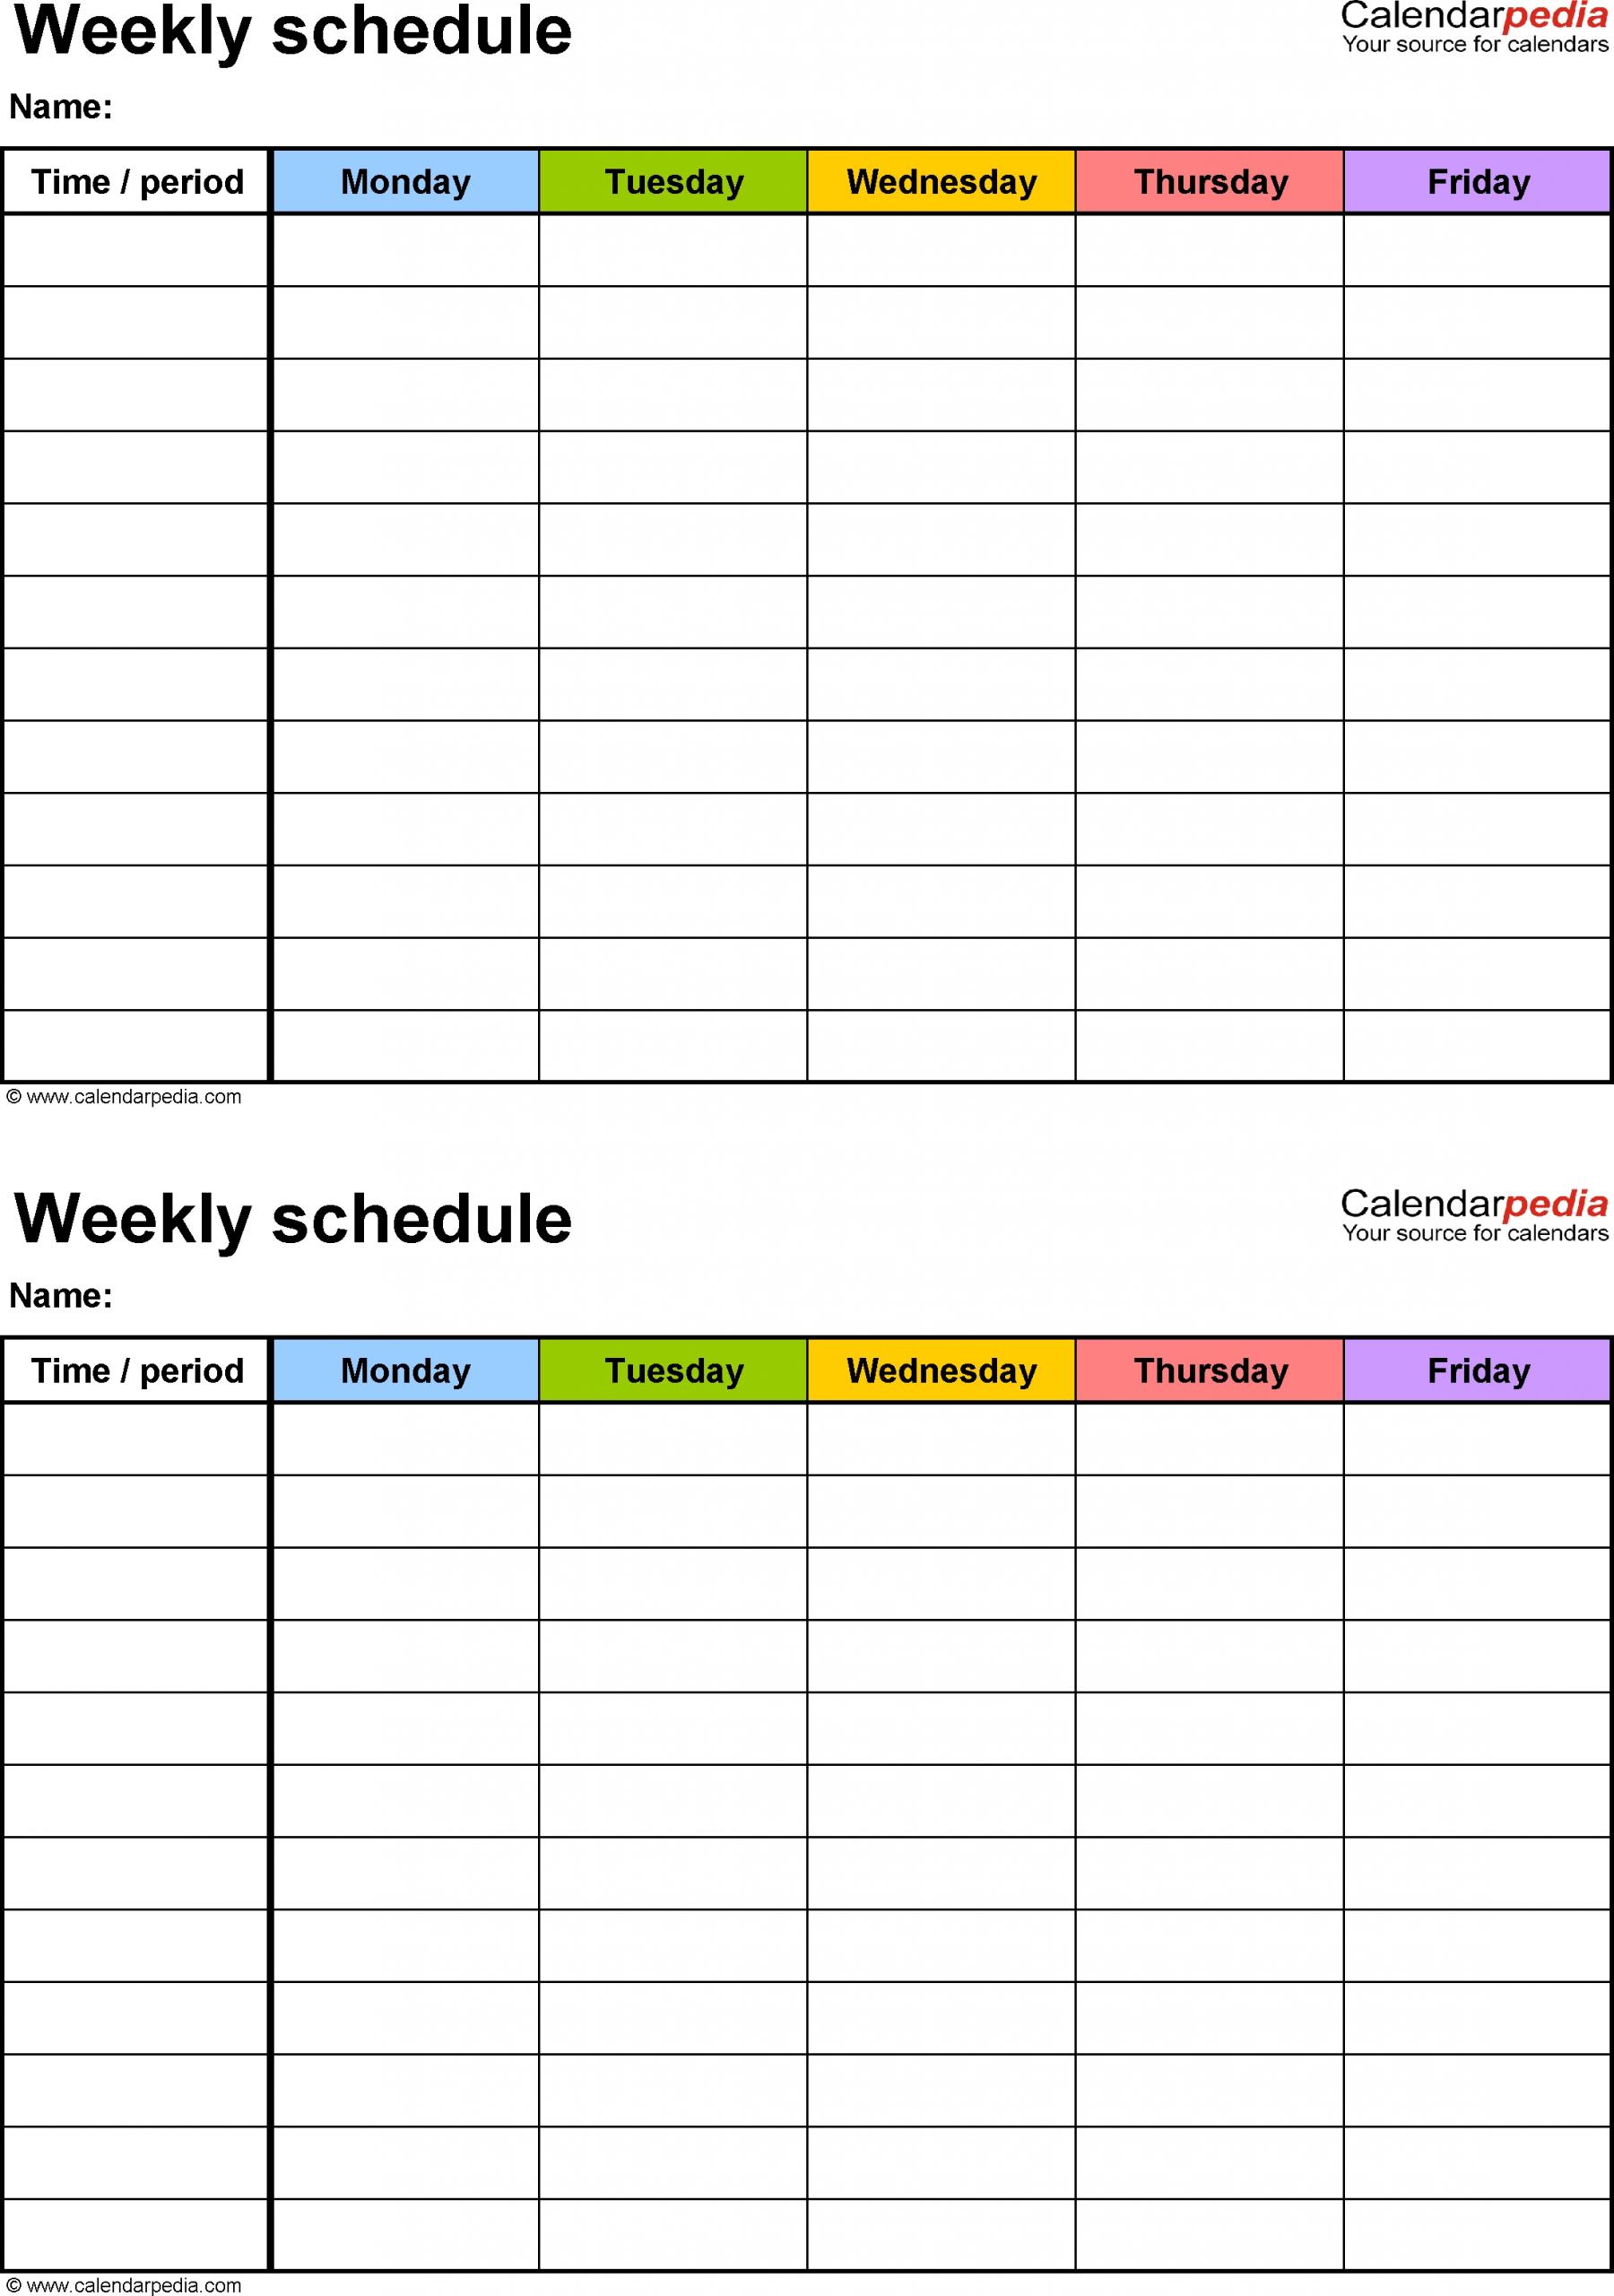 Monday Through Friday Scheule Pdf – Template Calendar Design Employee Monday To Sunday Schedule